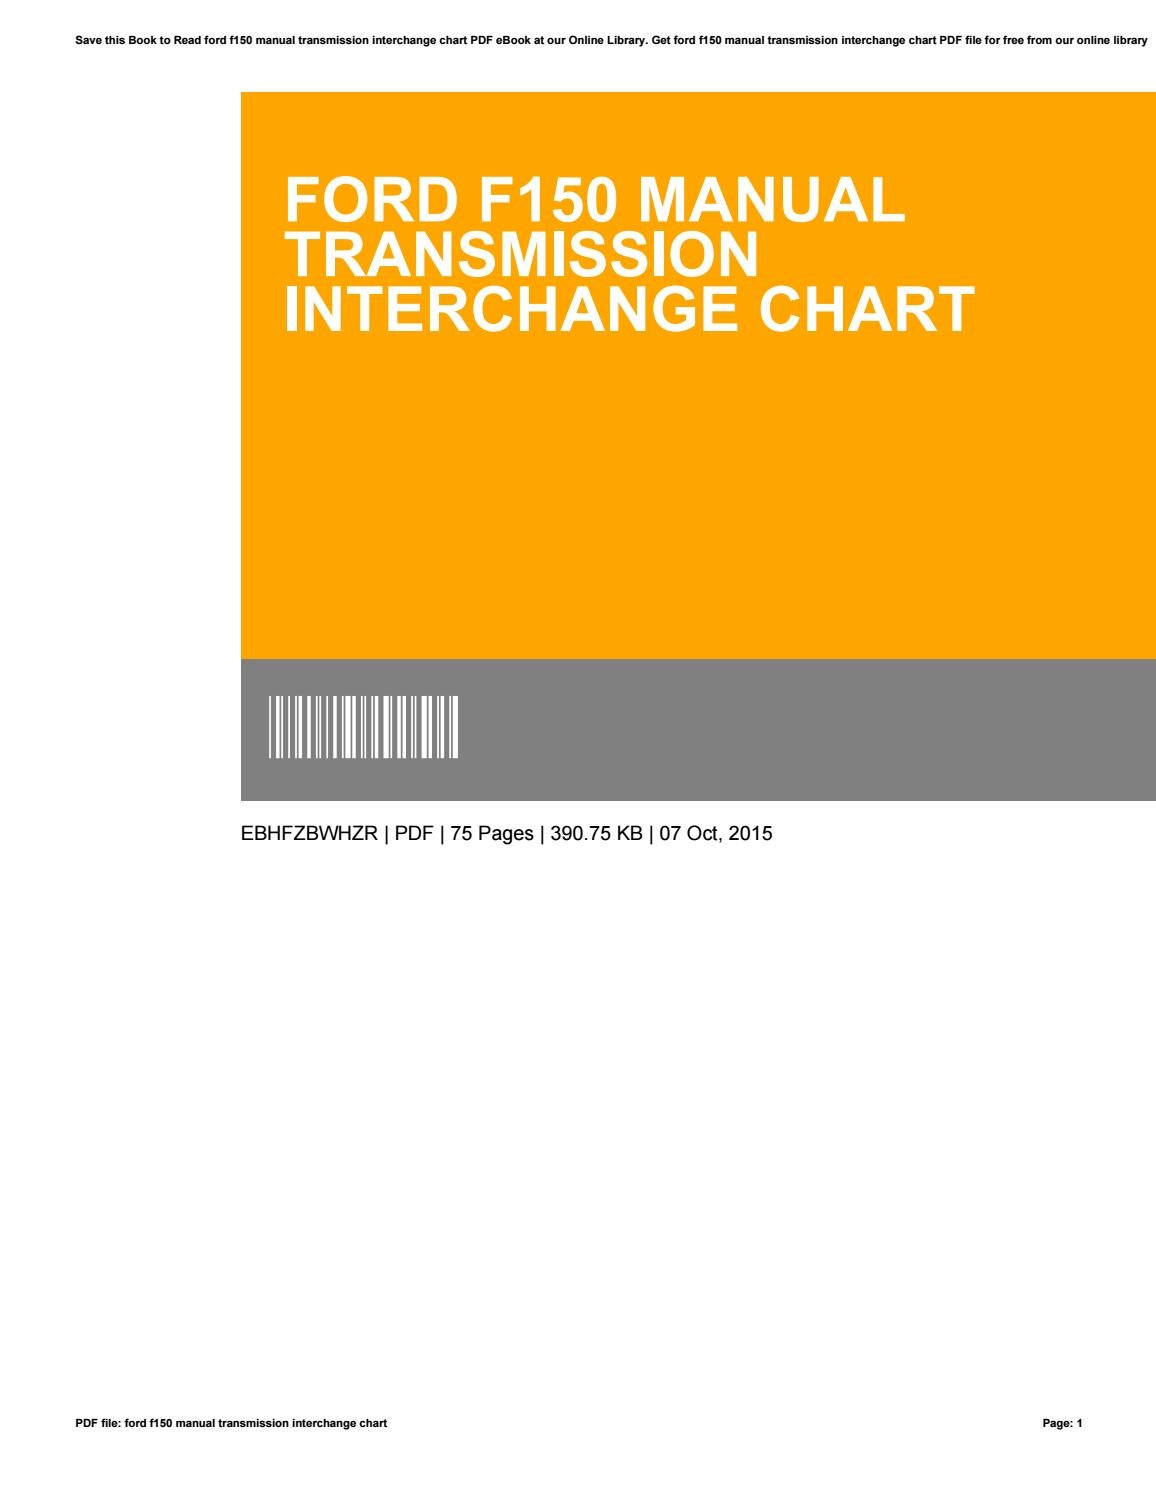 Free Ford interchange Manual